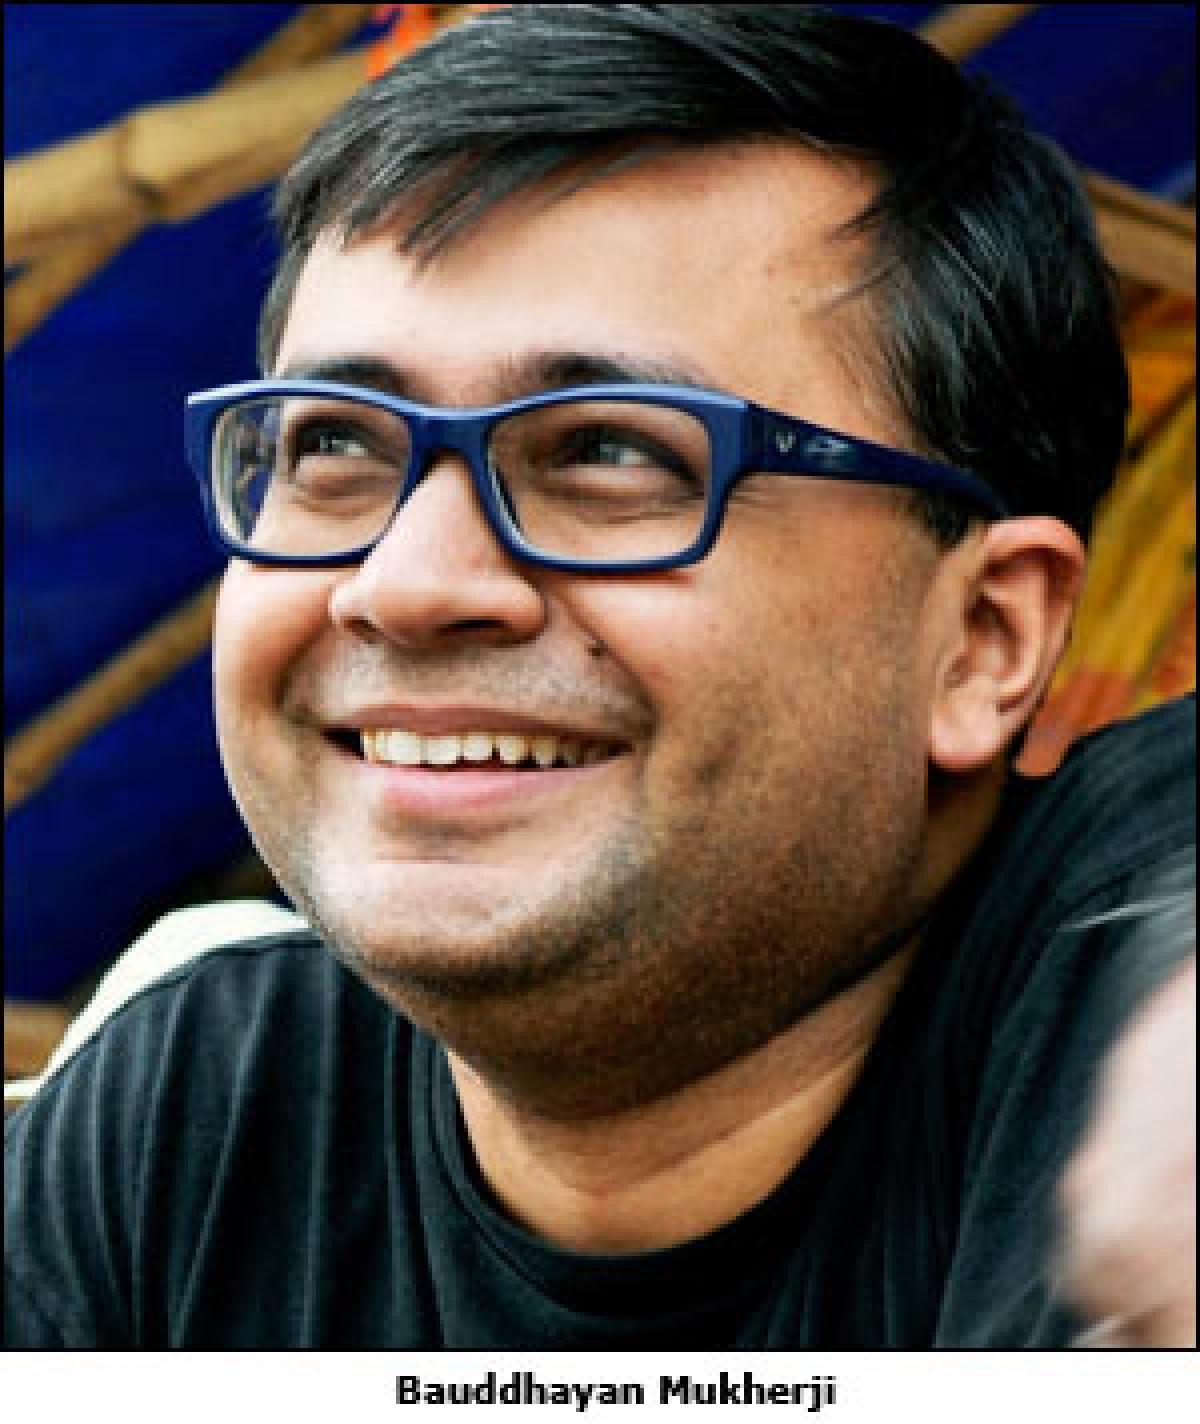 Ogilvy's betting on a Filaria-free India